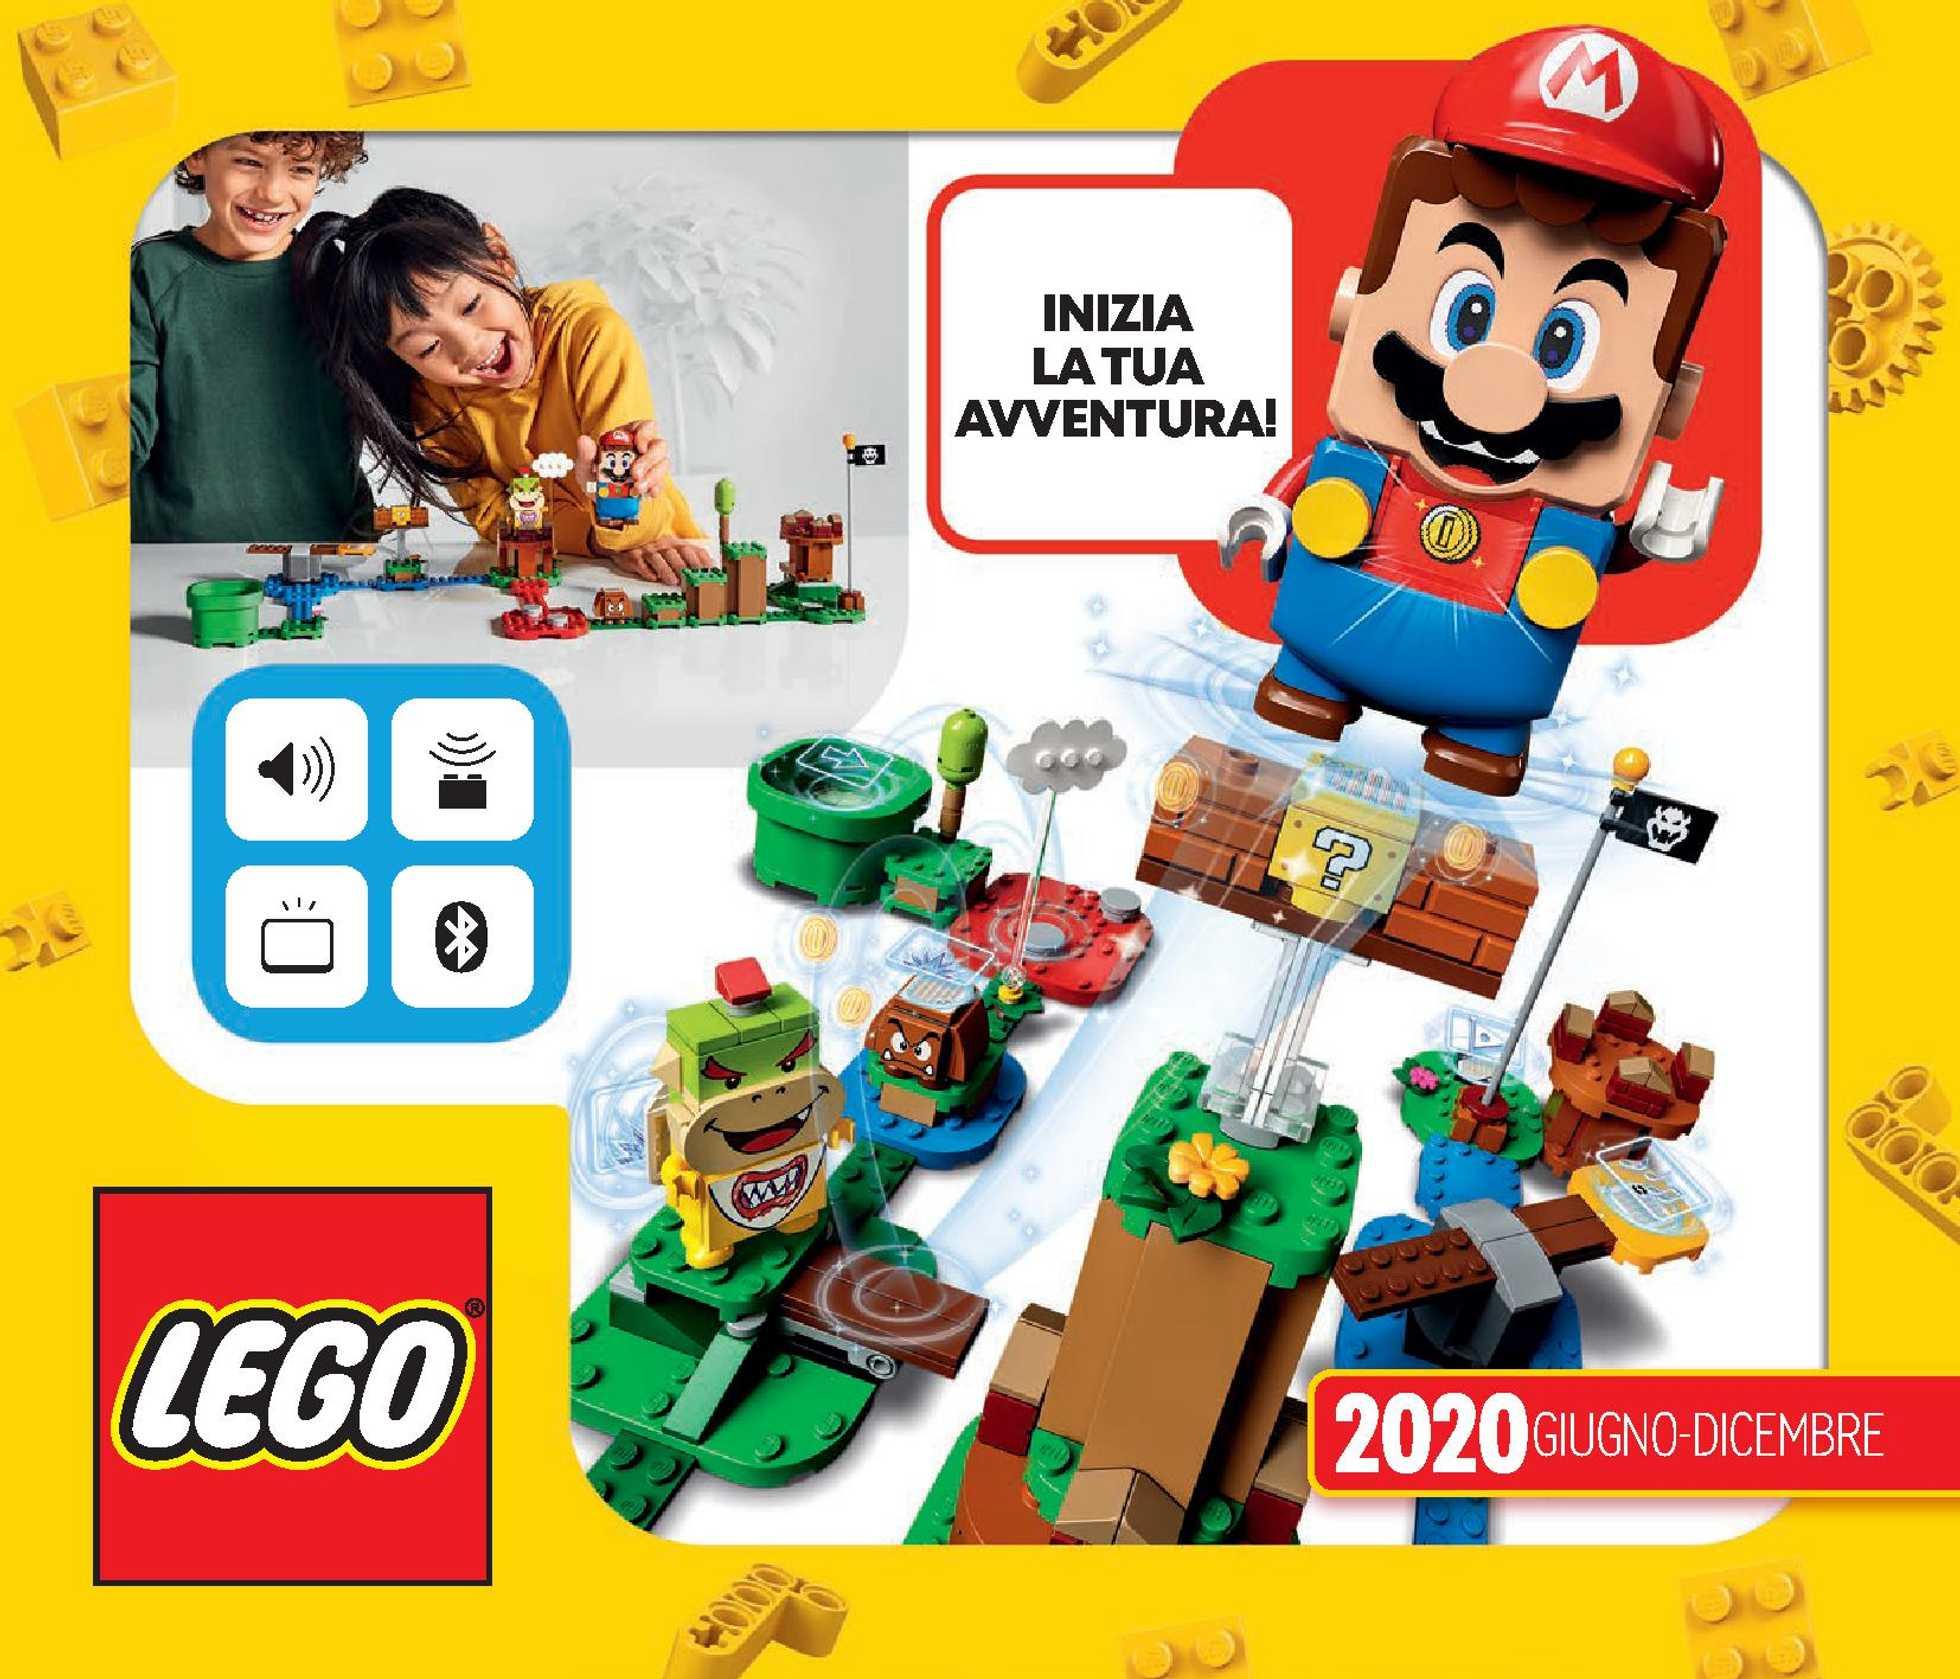 Lego - offerte valide dal 01.07.2020 al 31.12.2020 - pagina 1.